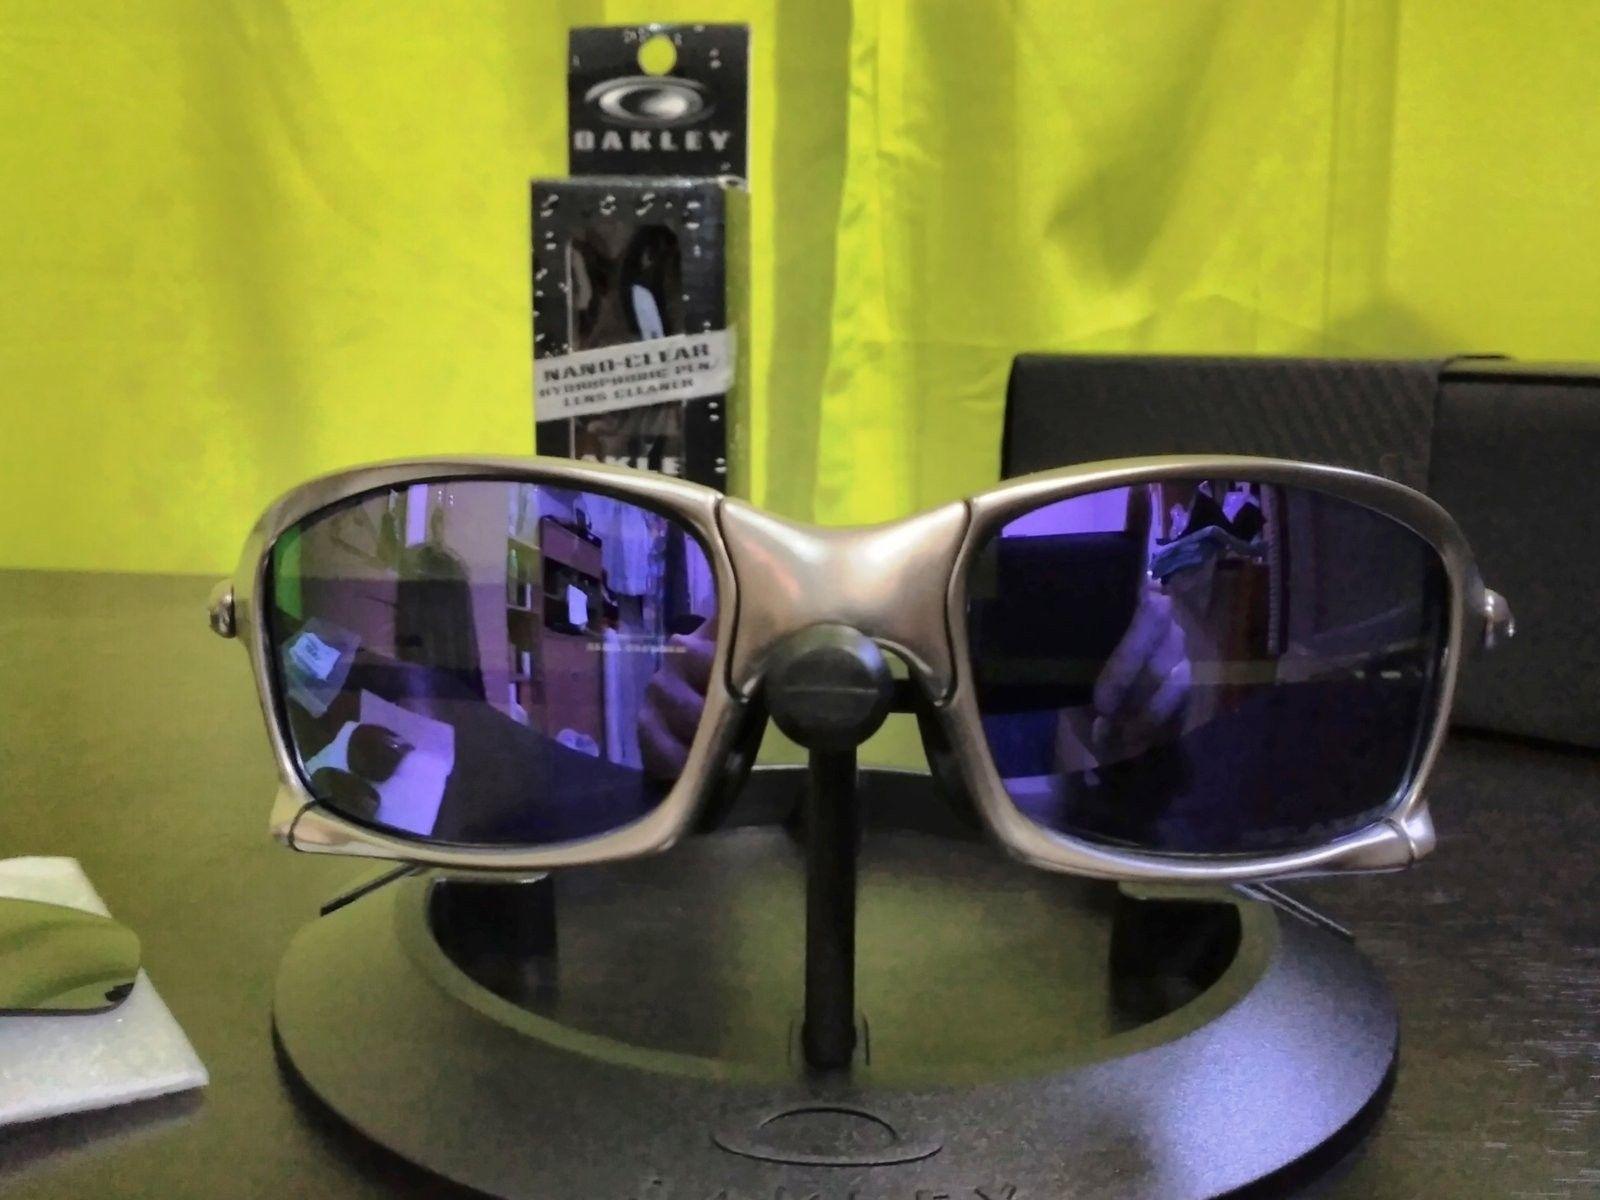 Xsquared Plasma with freebies $500 OBO - image1.jpg